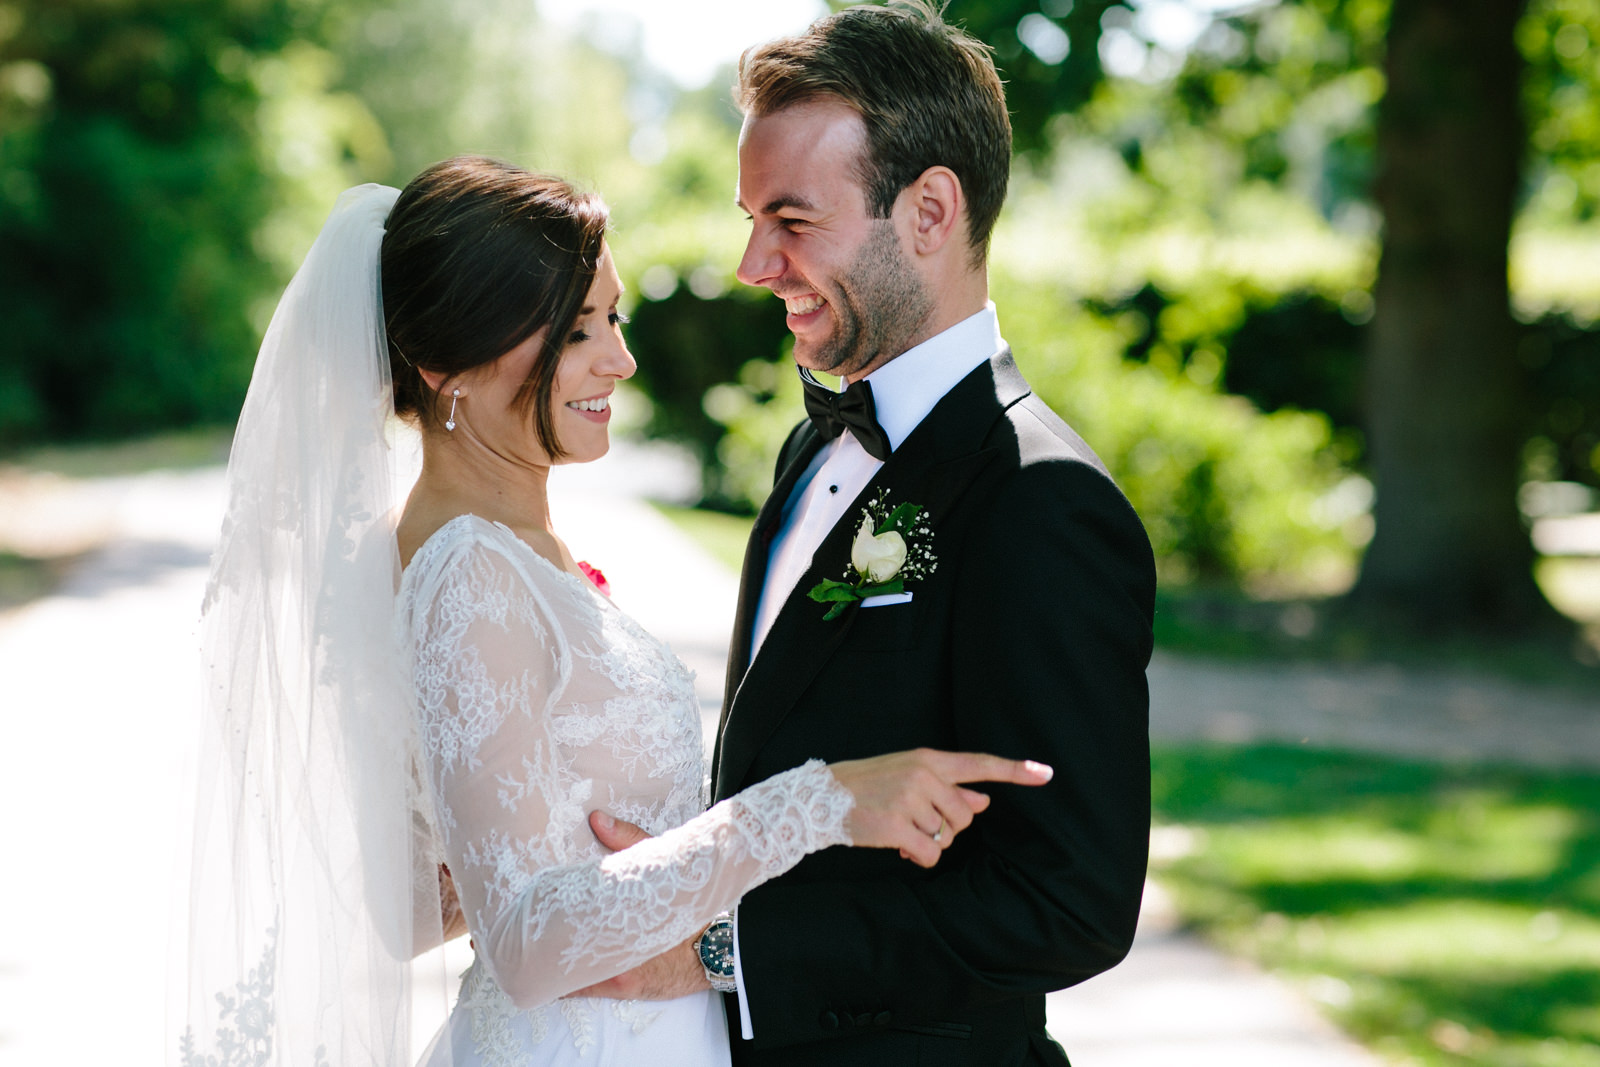 Stanbrooke Abbey Wedding Photographer-319523.jpg